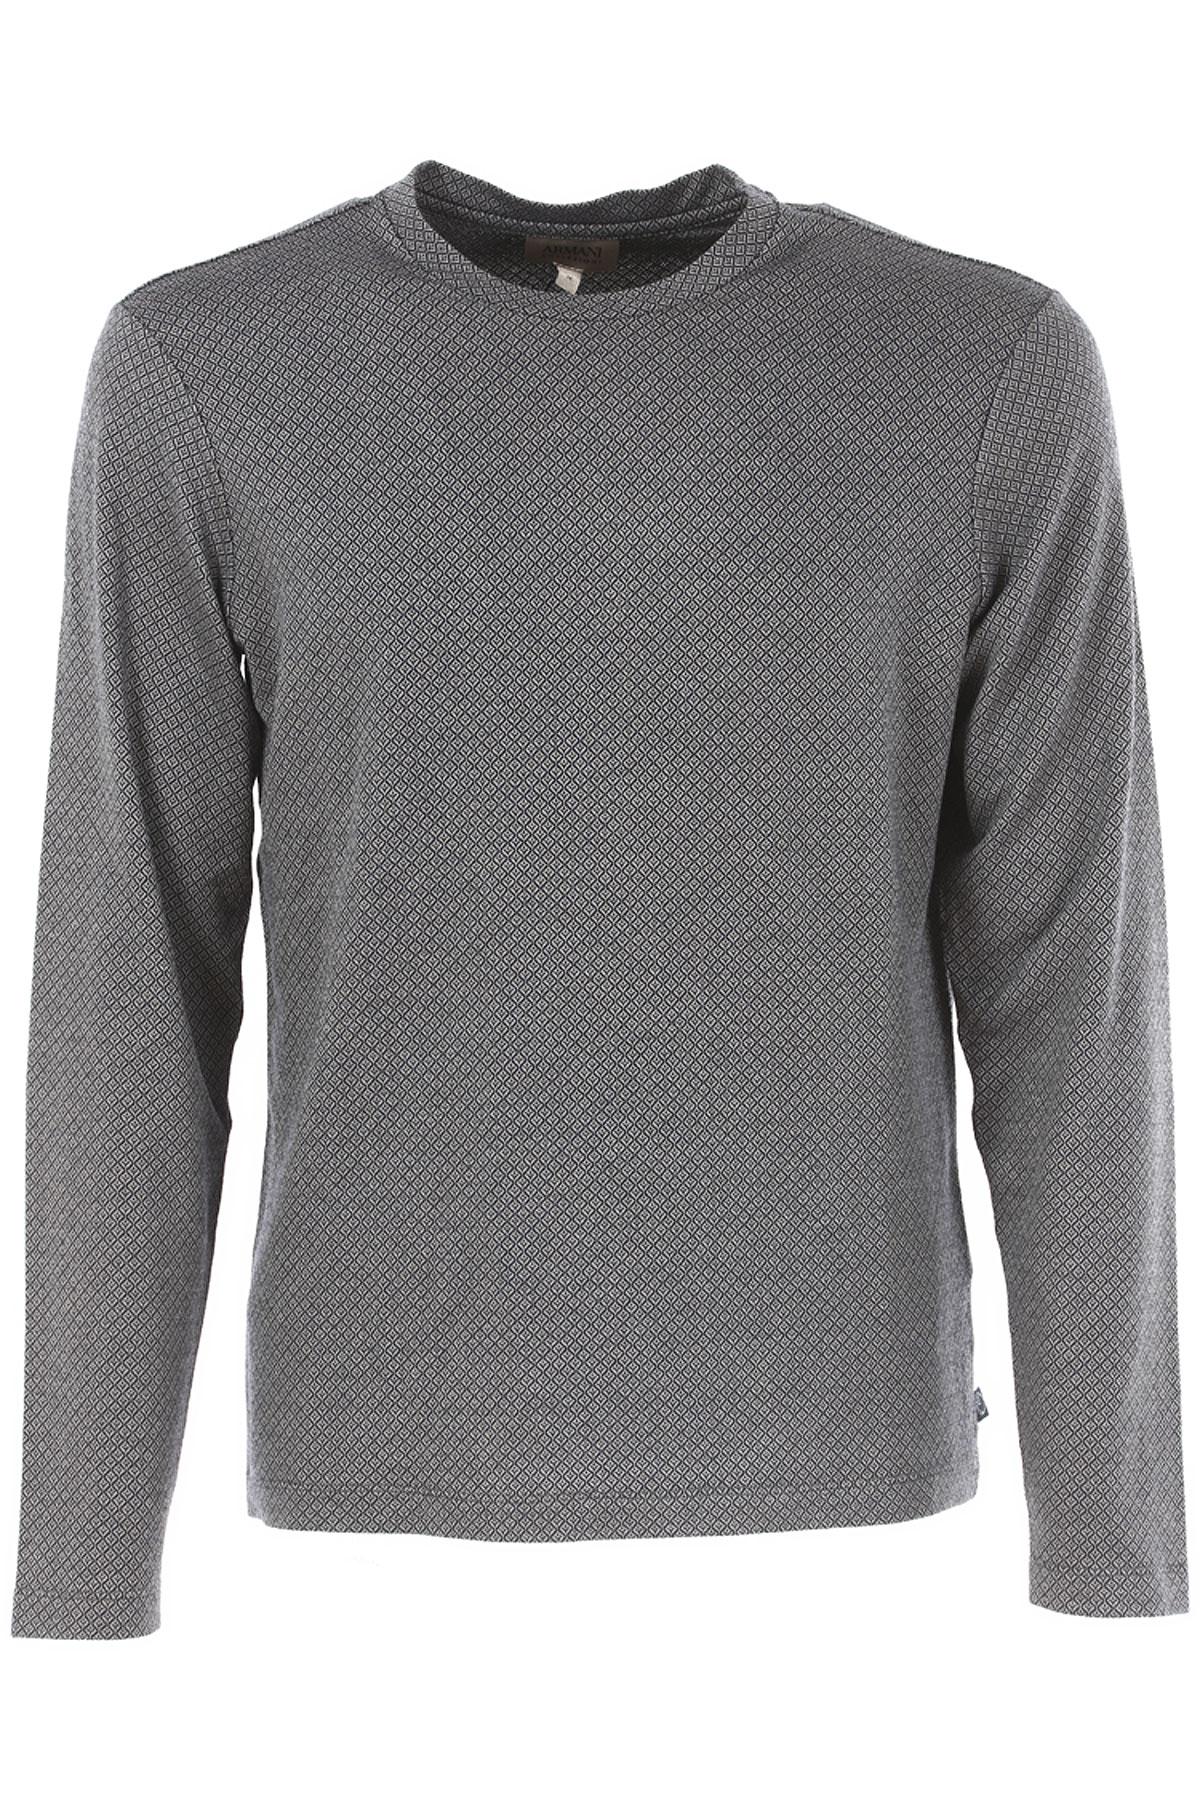 Emporio Armani T-Shirt for Men On Sale, Grey, Viscose, 2017, M S XL XXL XXXL USA-385500